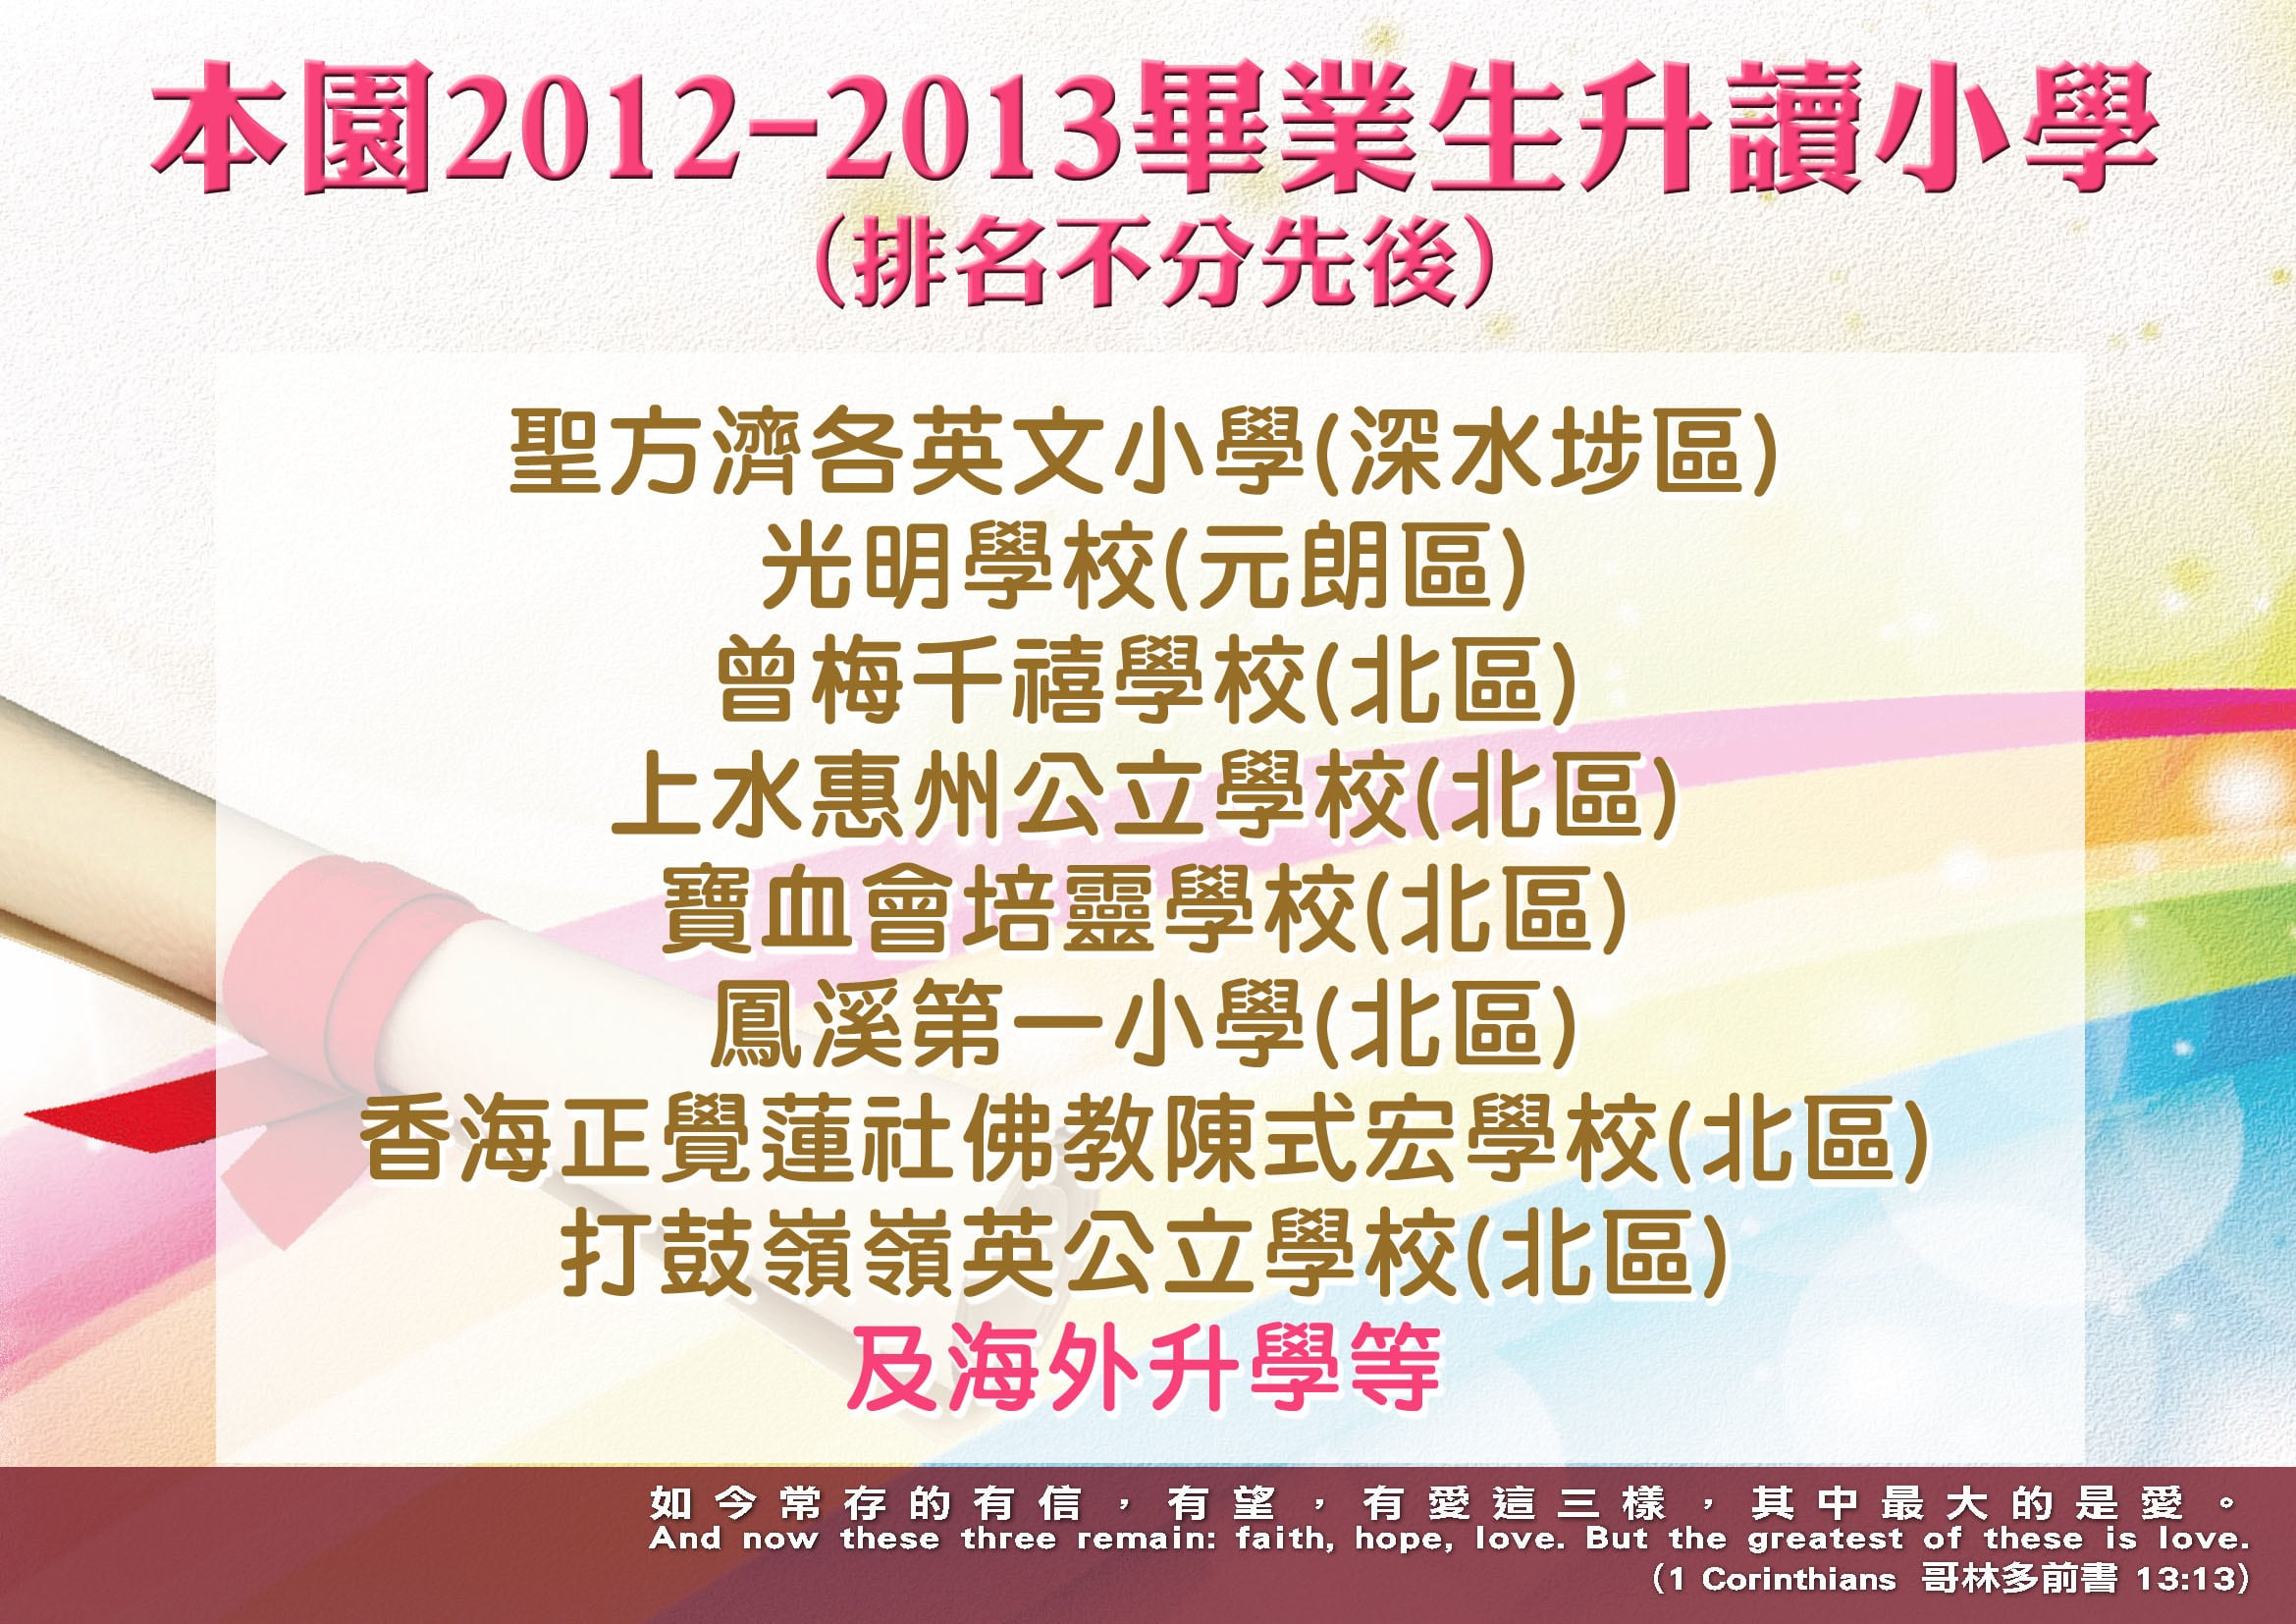 Photo of 本園2012-2013畢業生升讀小學